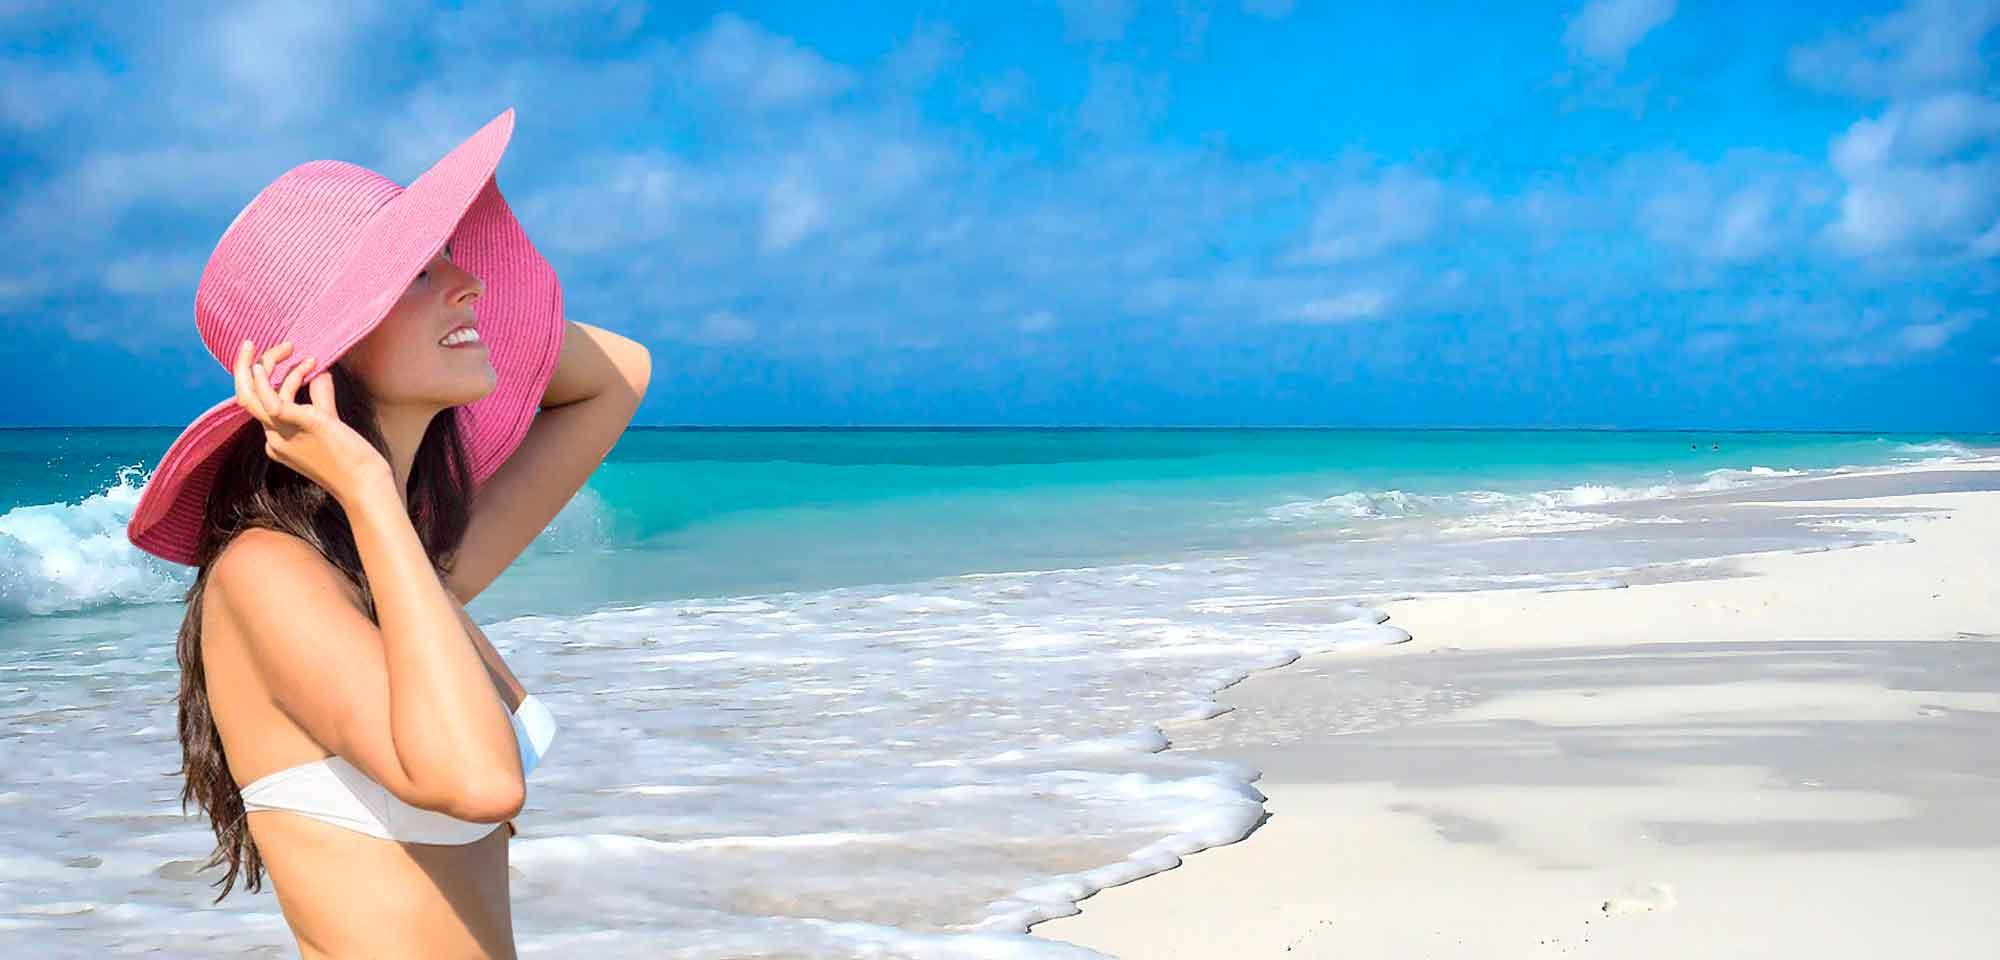 Paquetes Turísticos a Cuba - Cayo Coco